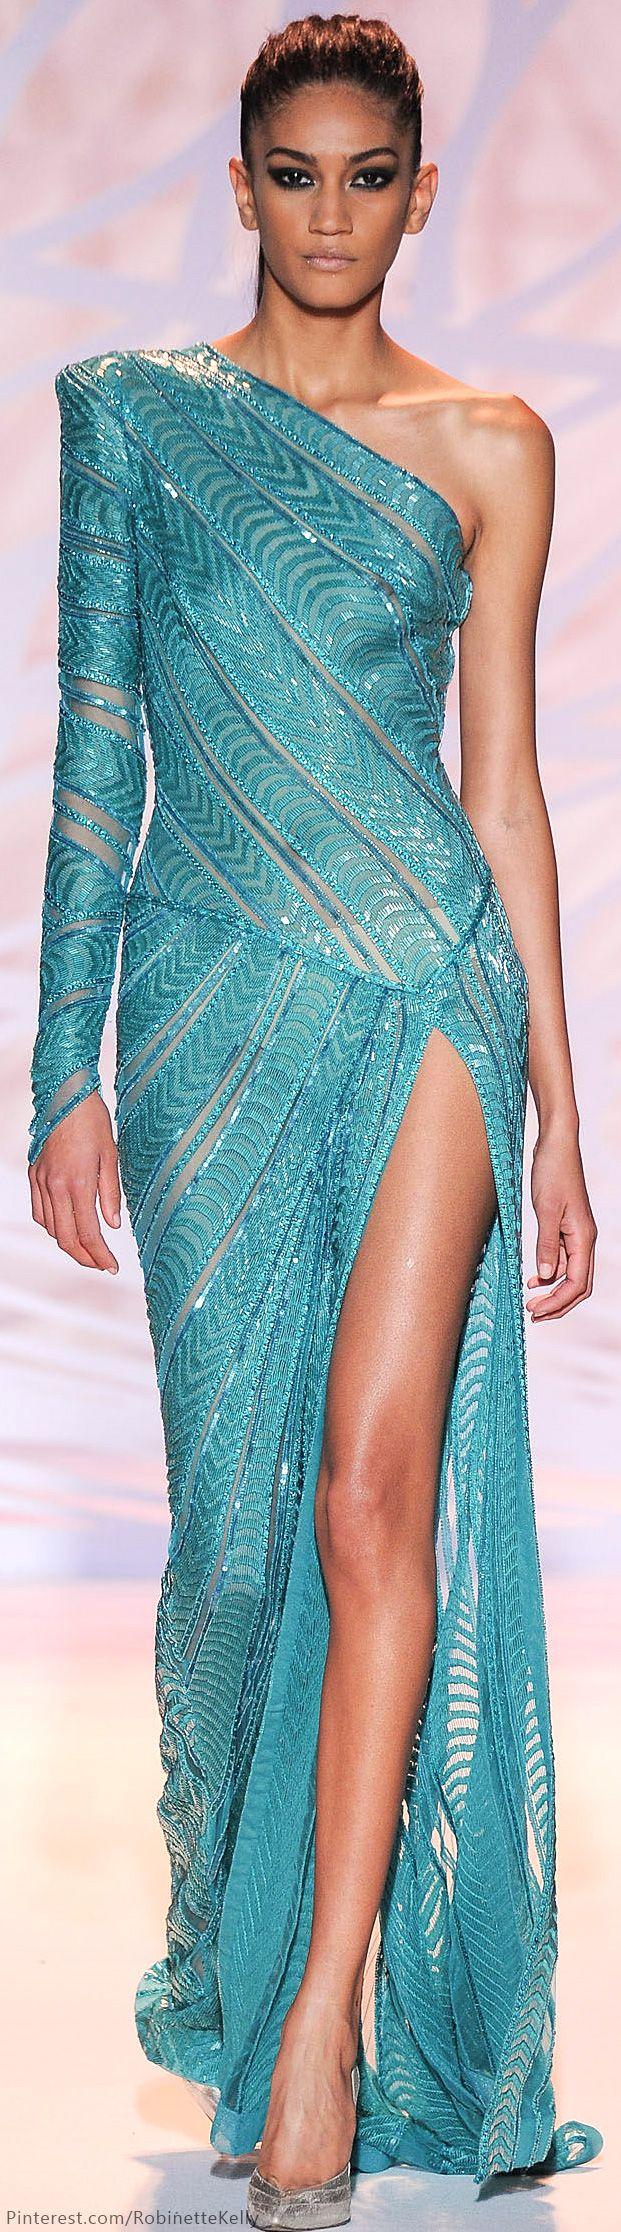 Zuhair Murad Haute Couture | F/W 2015 jaglady